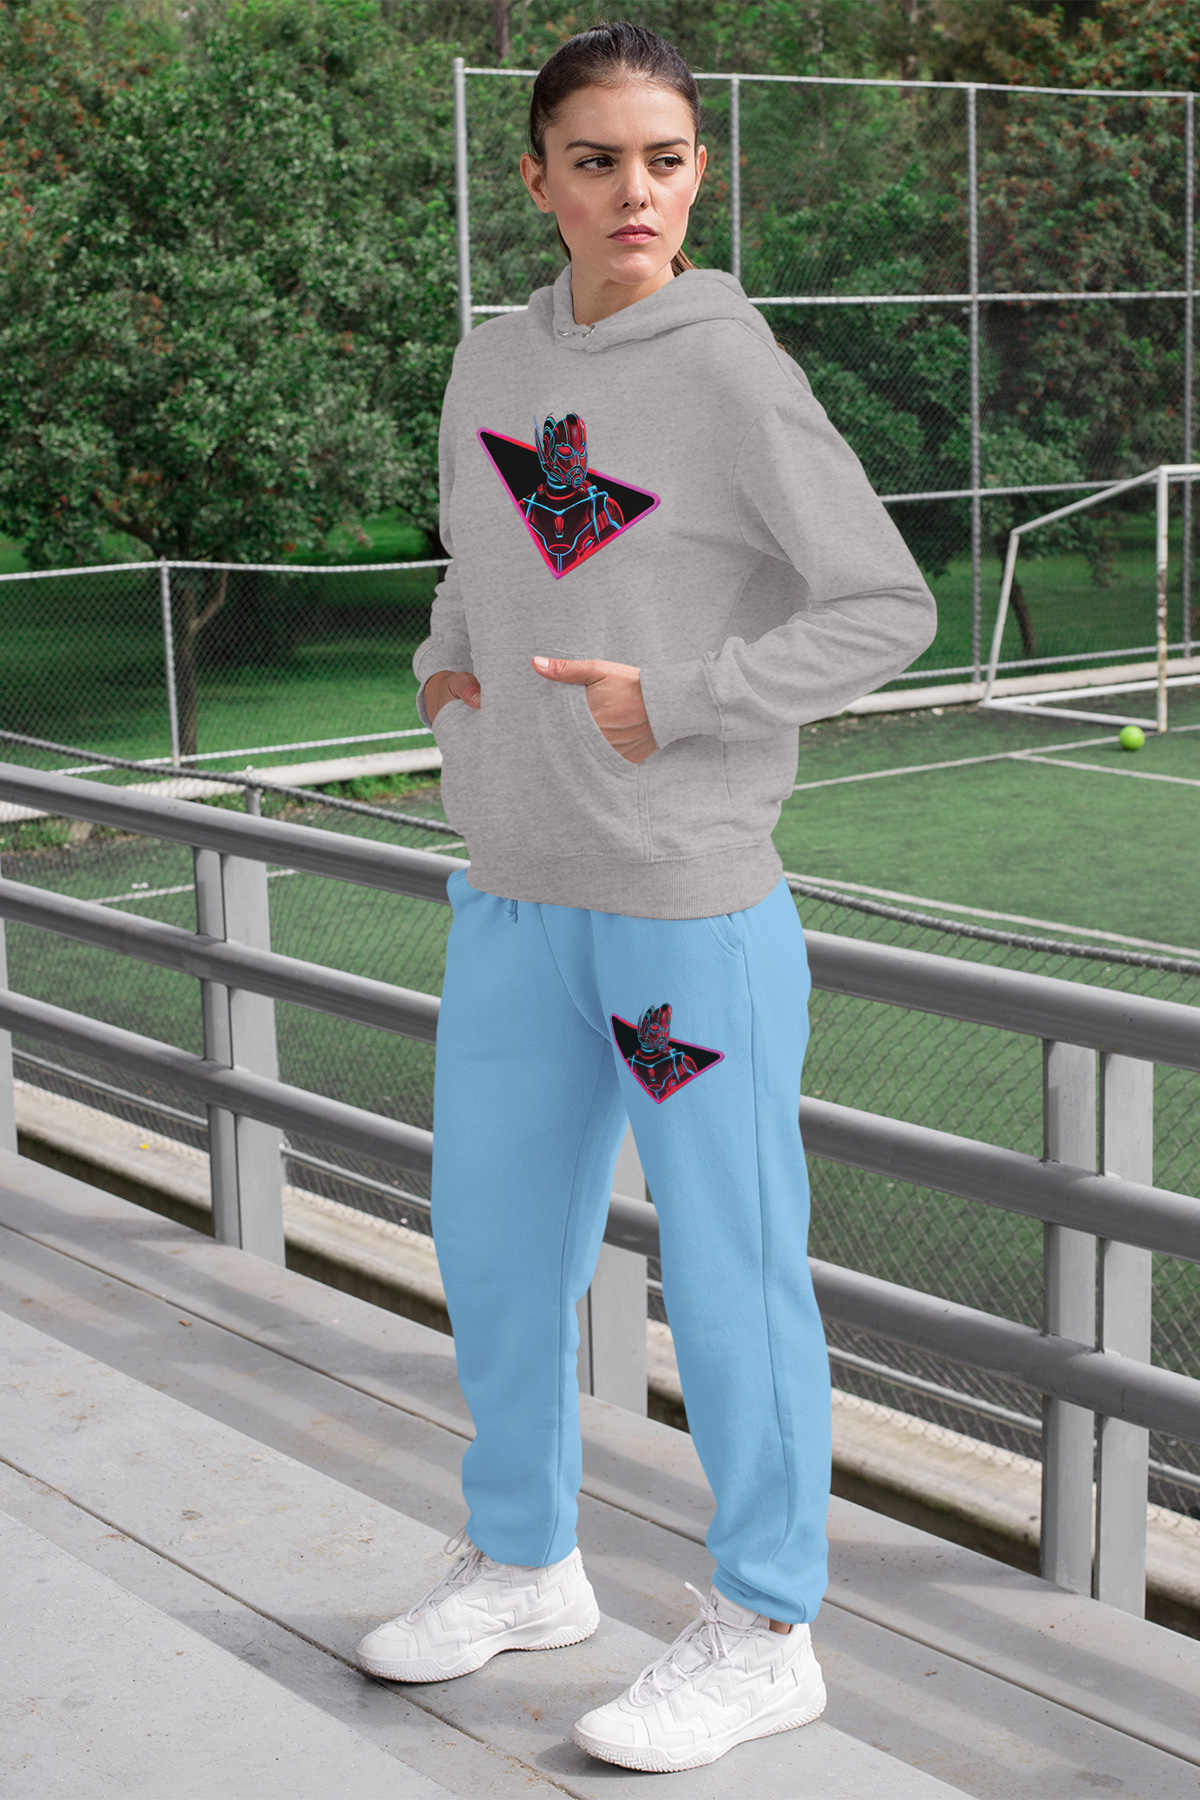 Angemiel Wear Ant Hombre Mujer Chandal Conjunto Gris Sudadera Con Capucha Pantalones De Chandal Azul Aliexpress